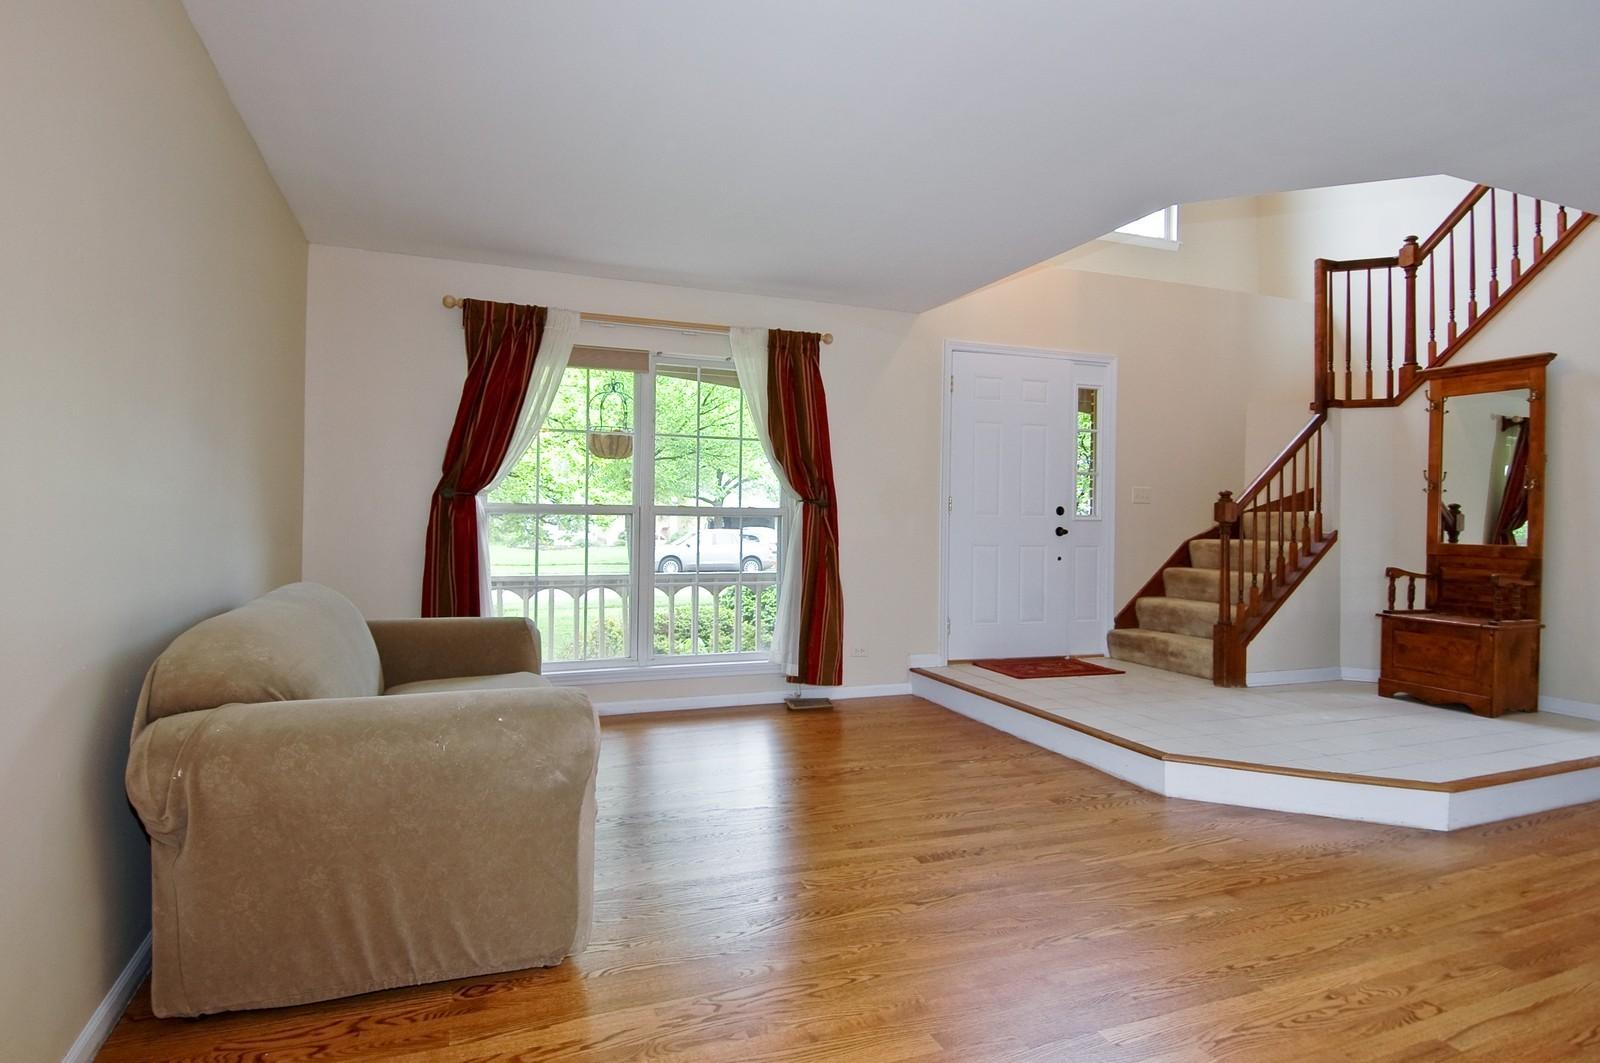 Real Estate Photography - 1086 Camillia, Fox River Grove, IL, 60021 - Foyer/Living Room